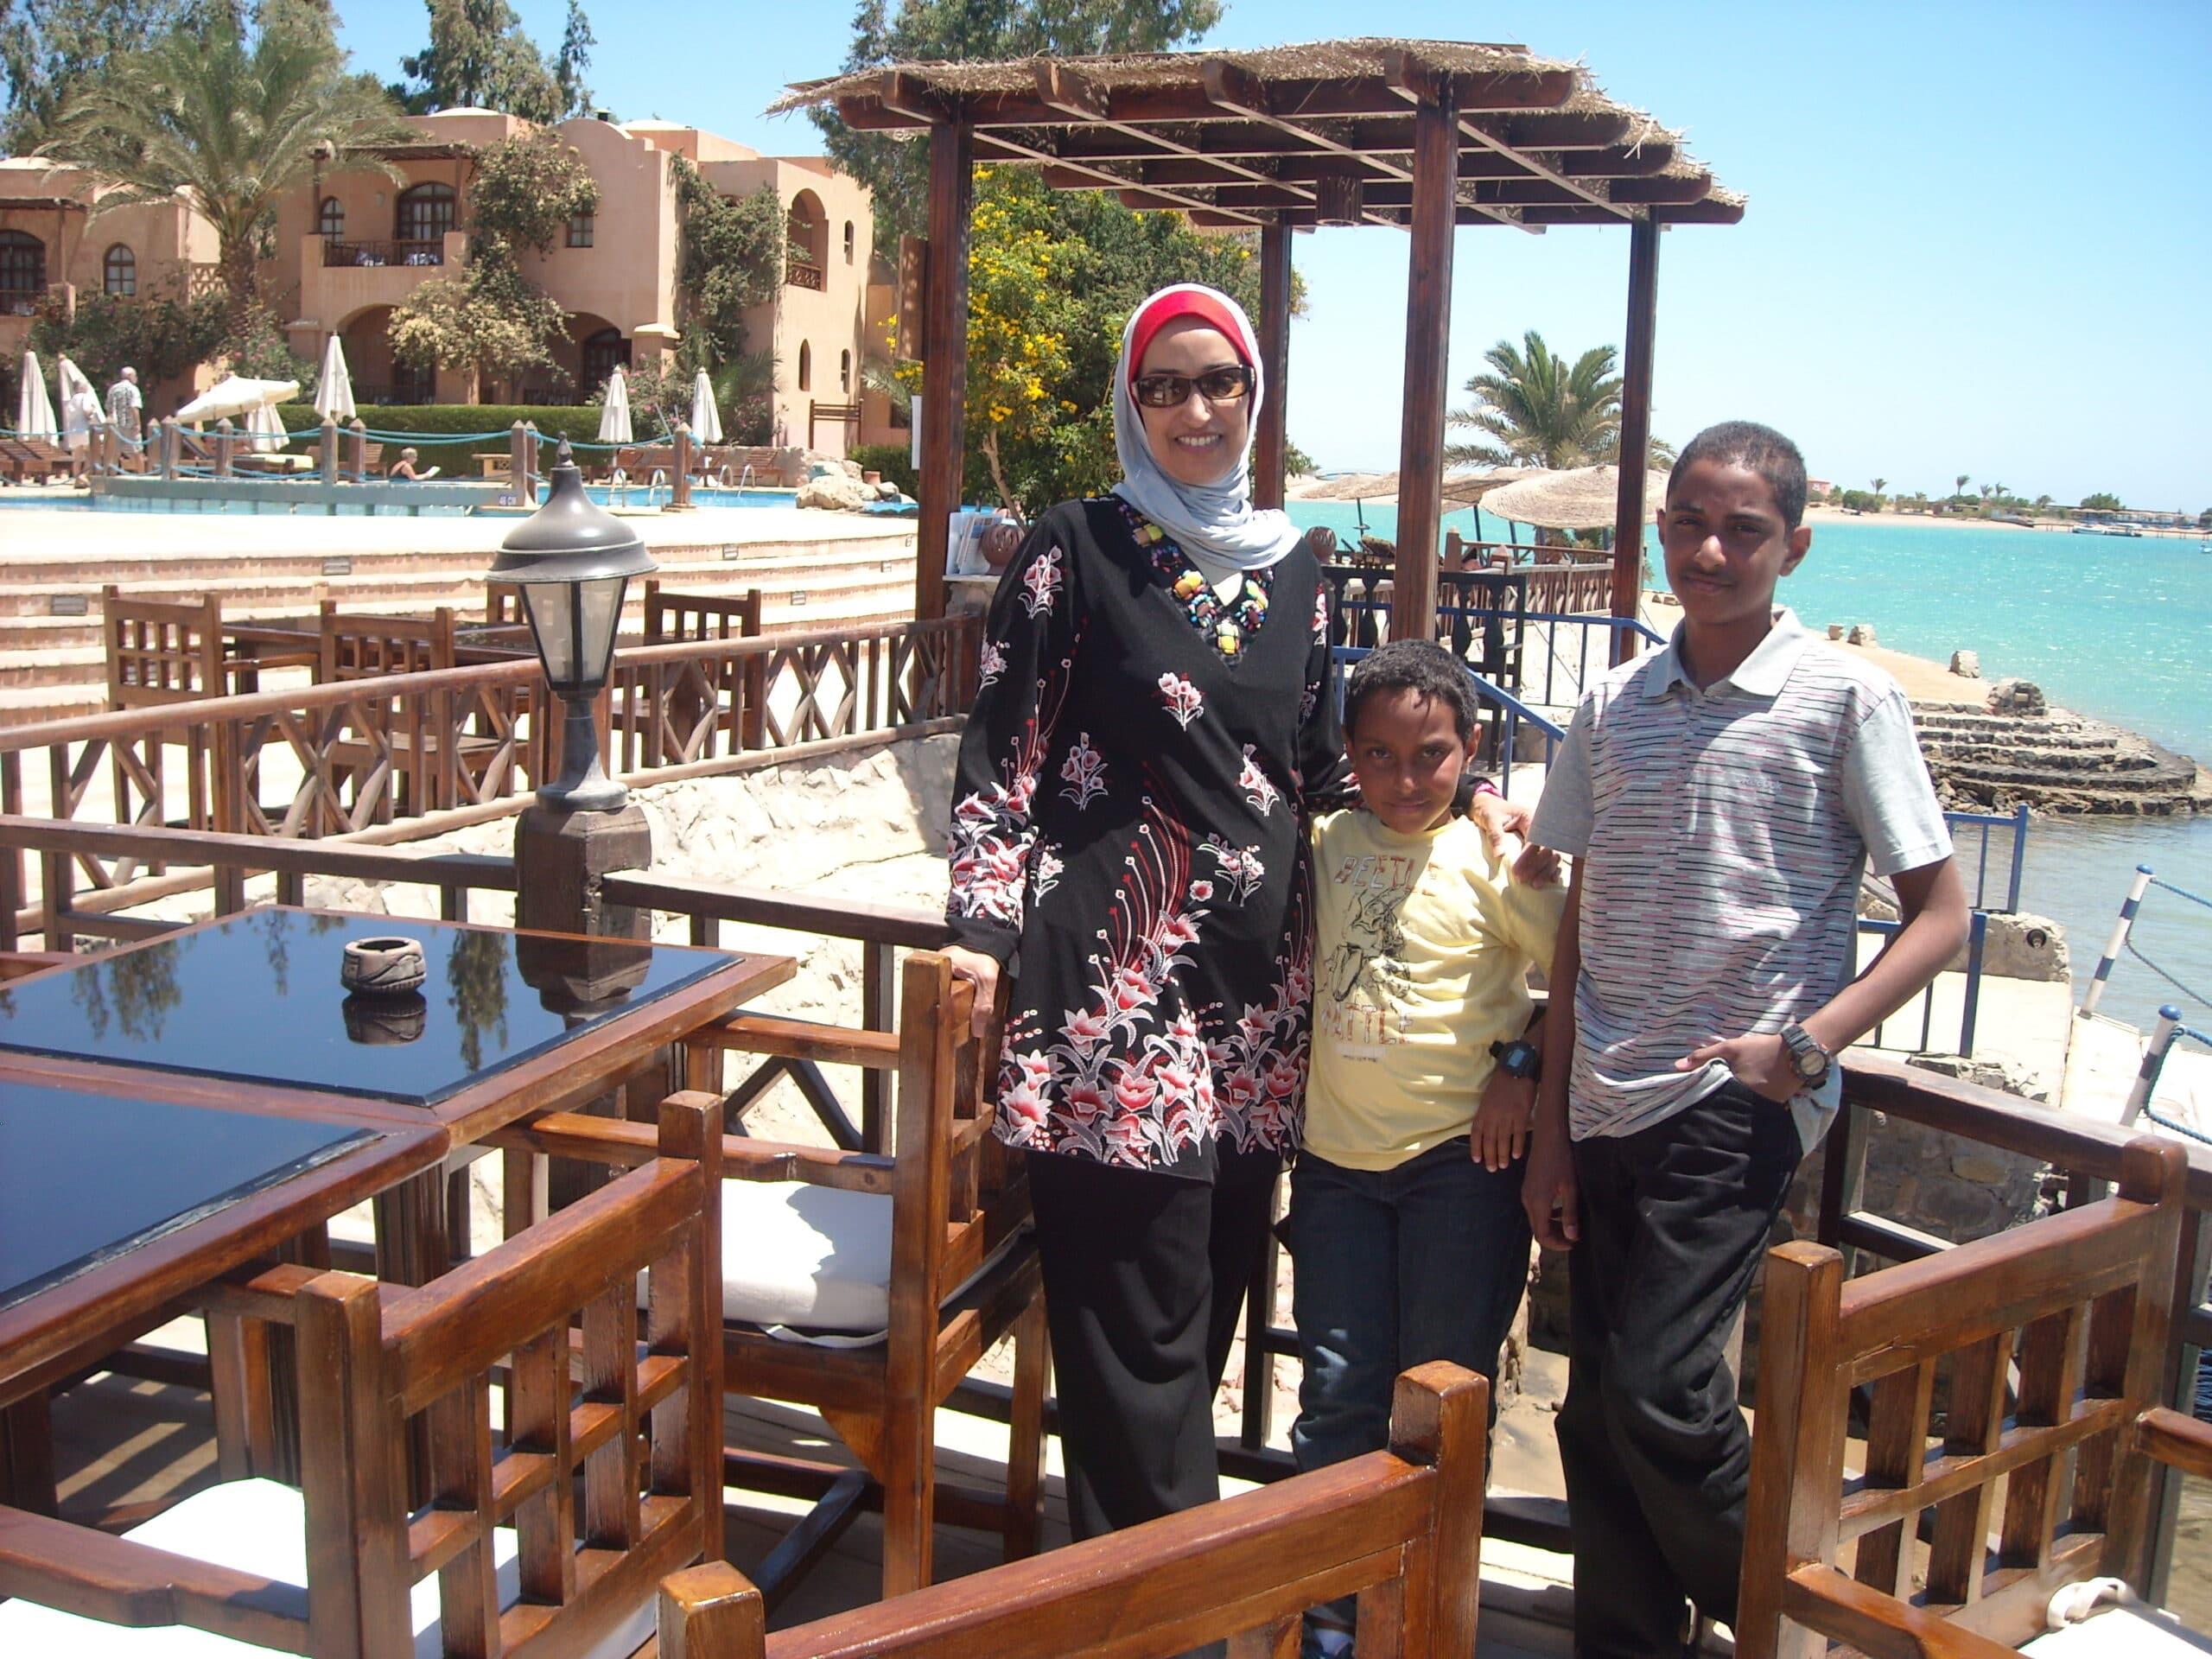 EGYPT: The Generosity Month (Ramadan)